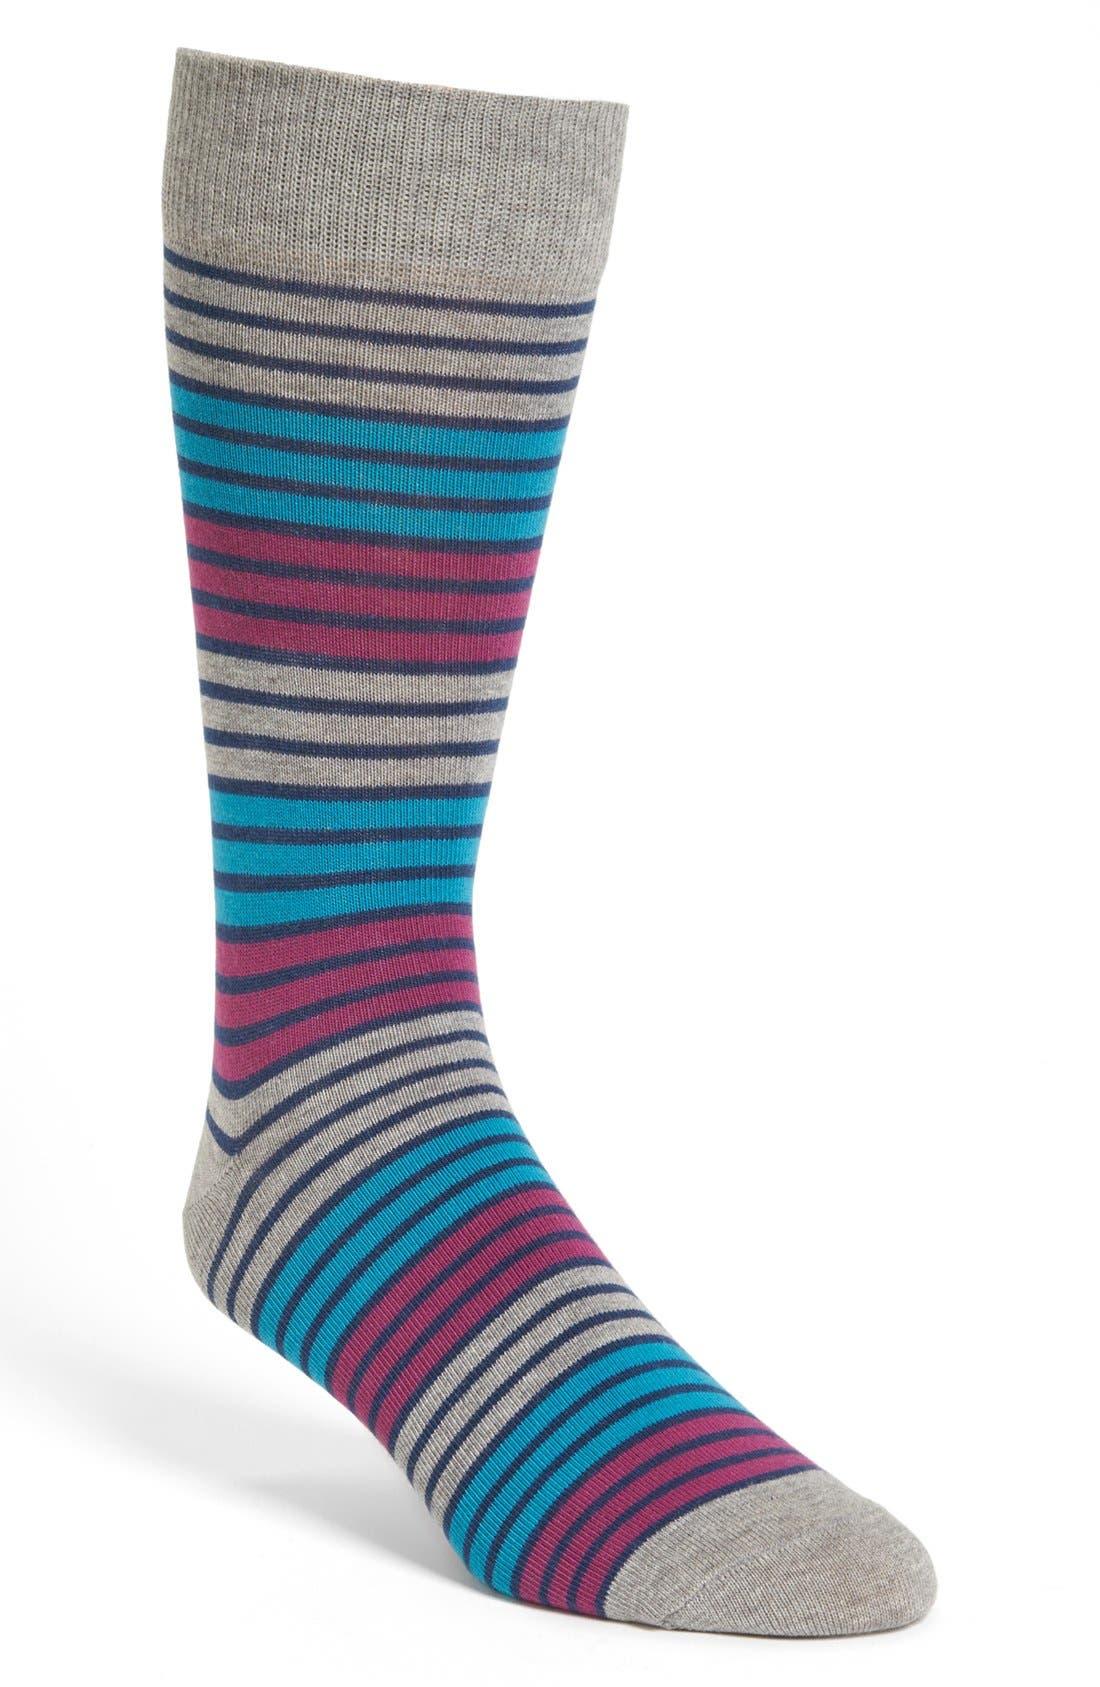 Alternate Image 1 Selected - Pact Triple Stripe Socks